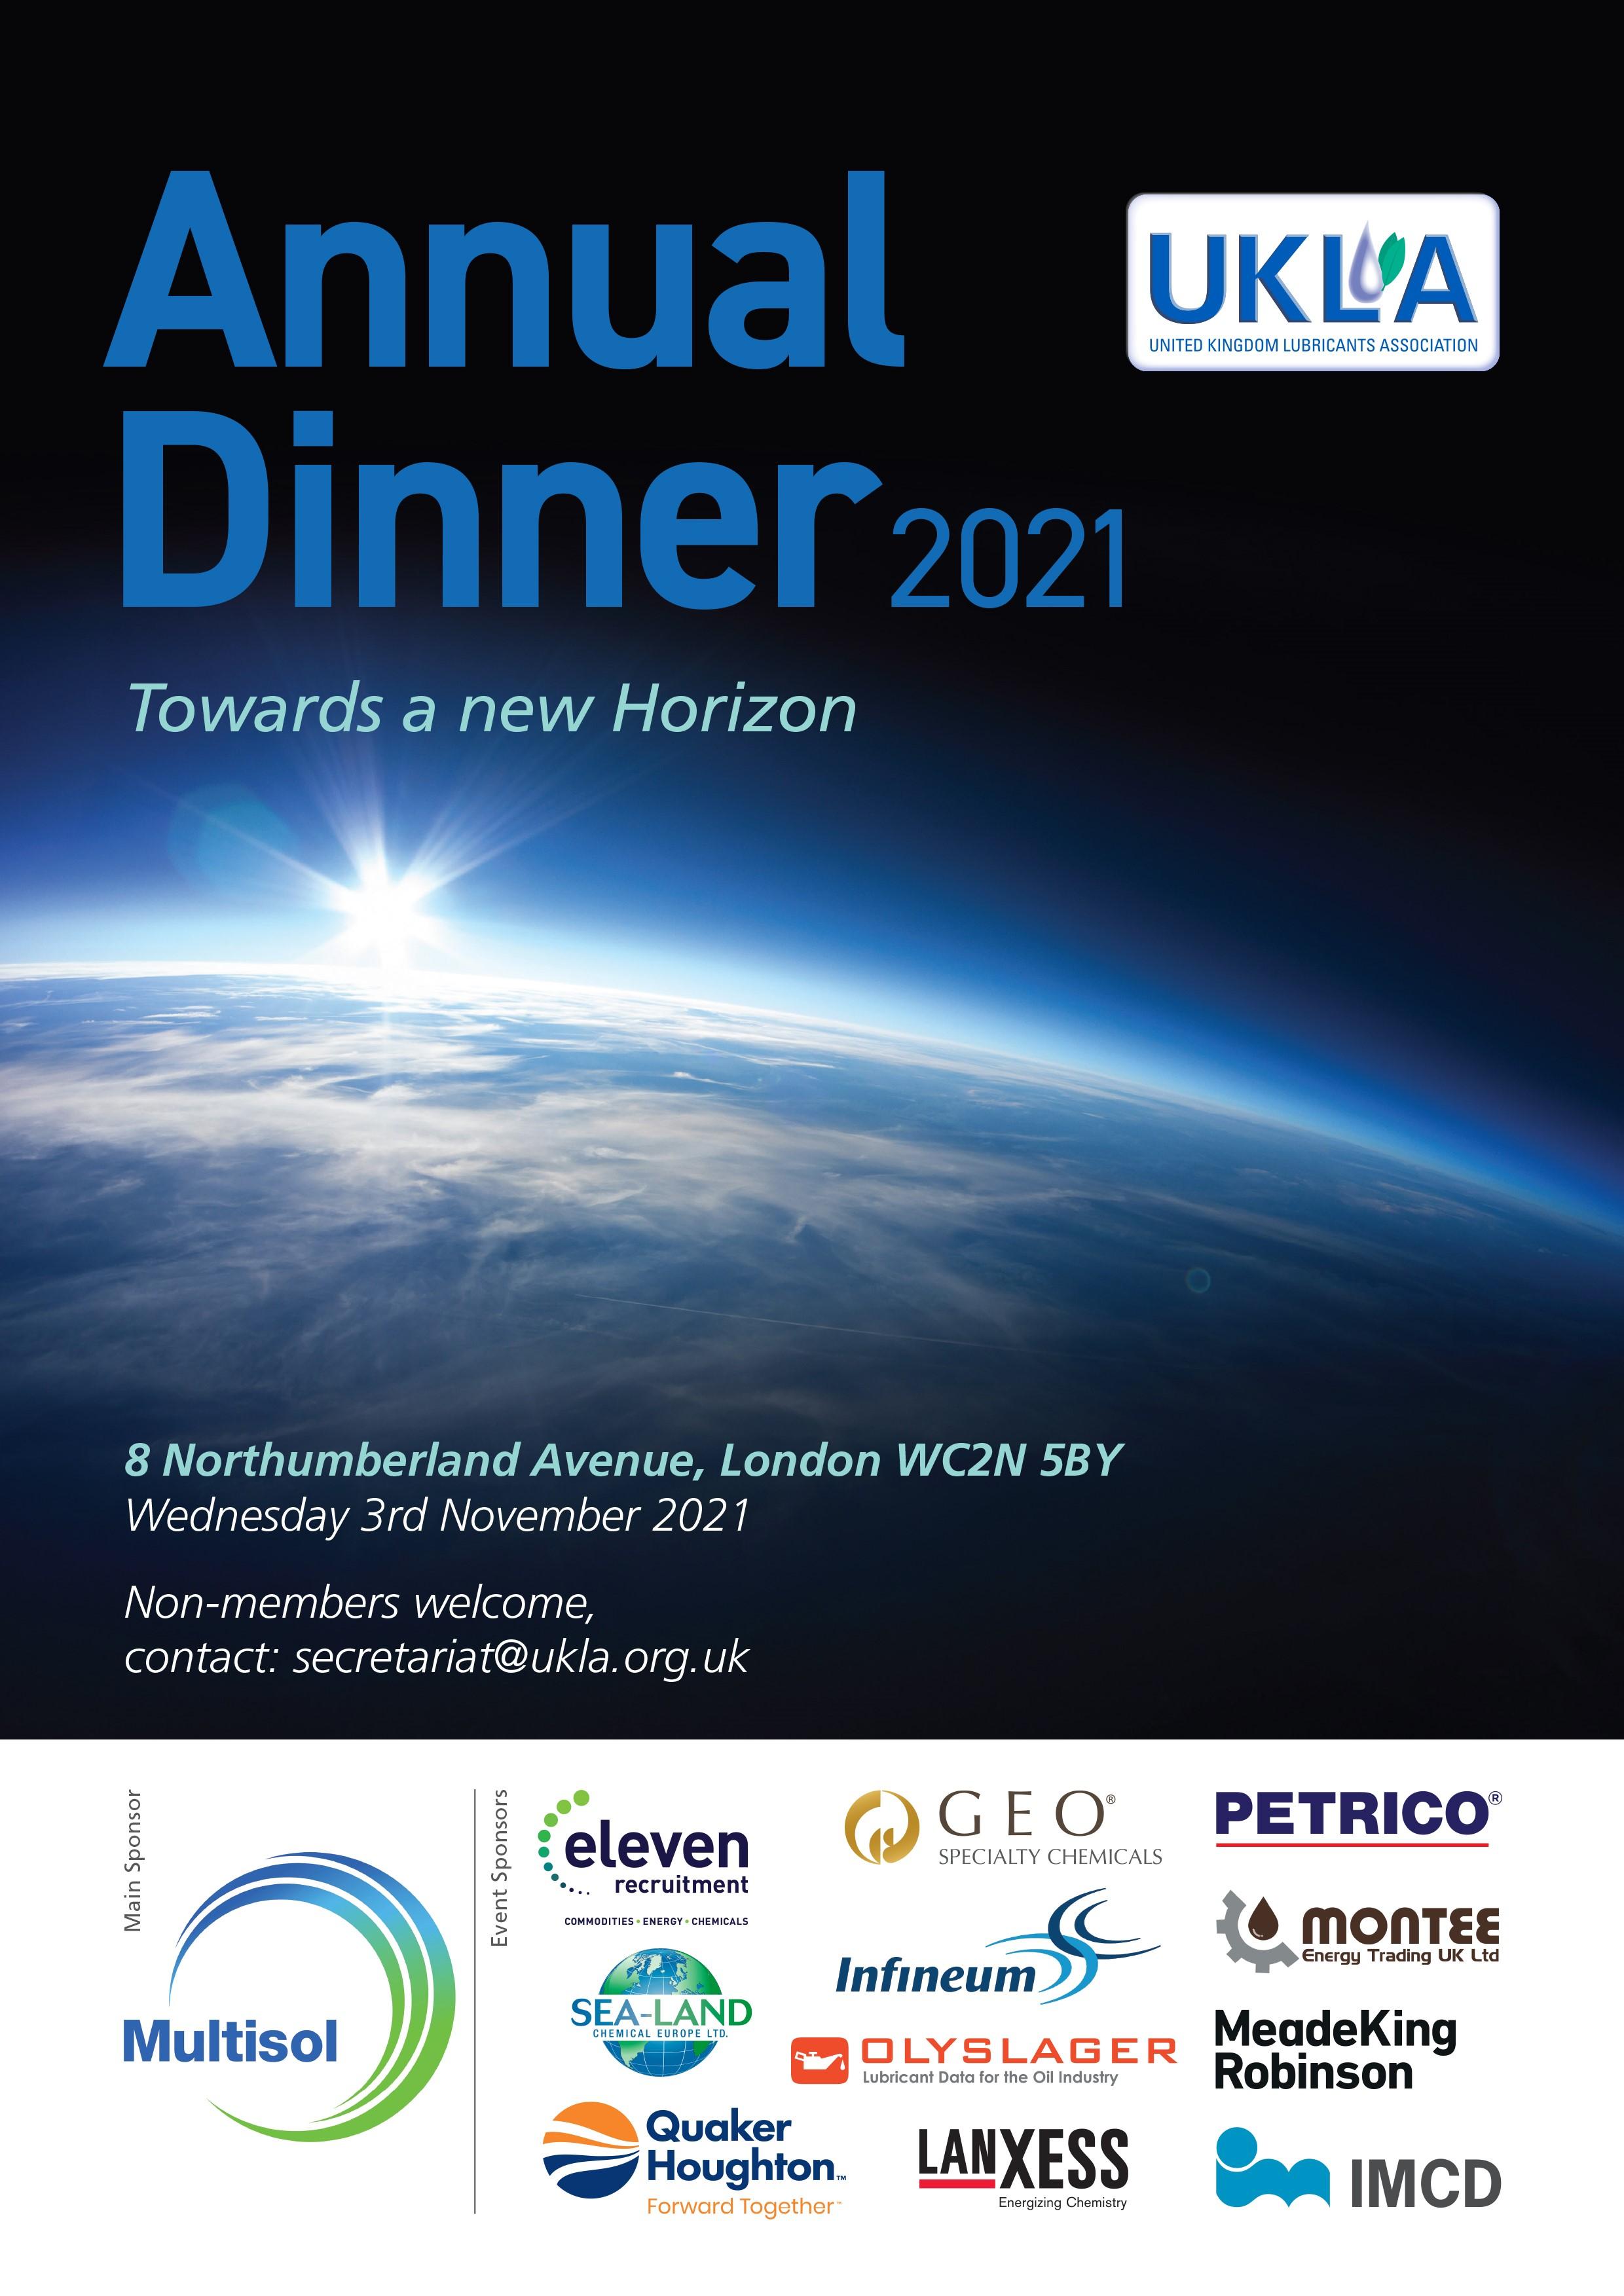 Annual Dinner Ad April 2021